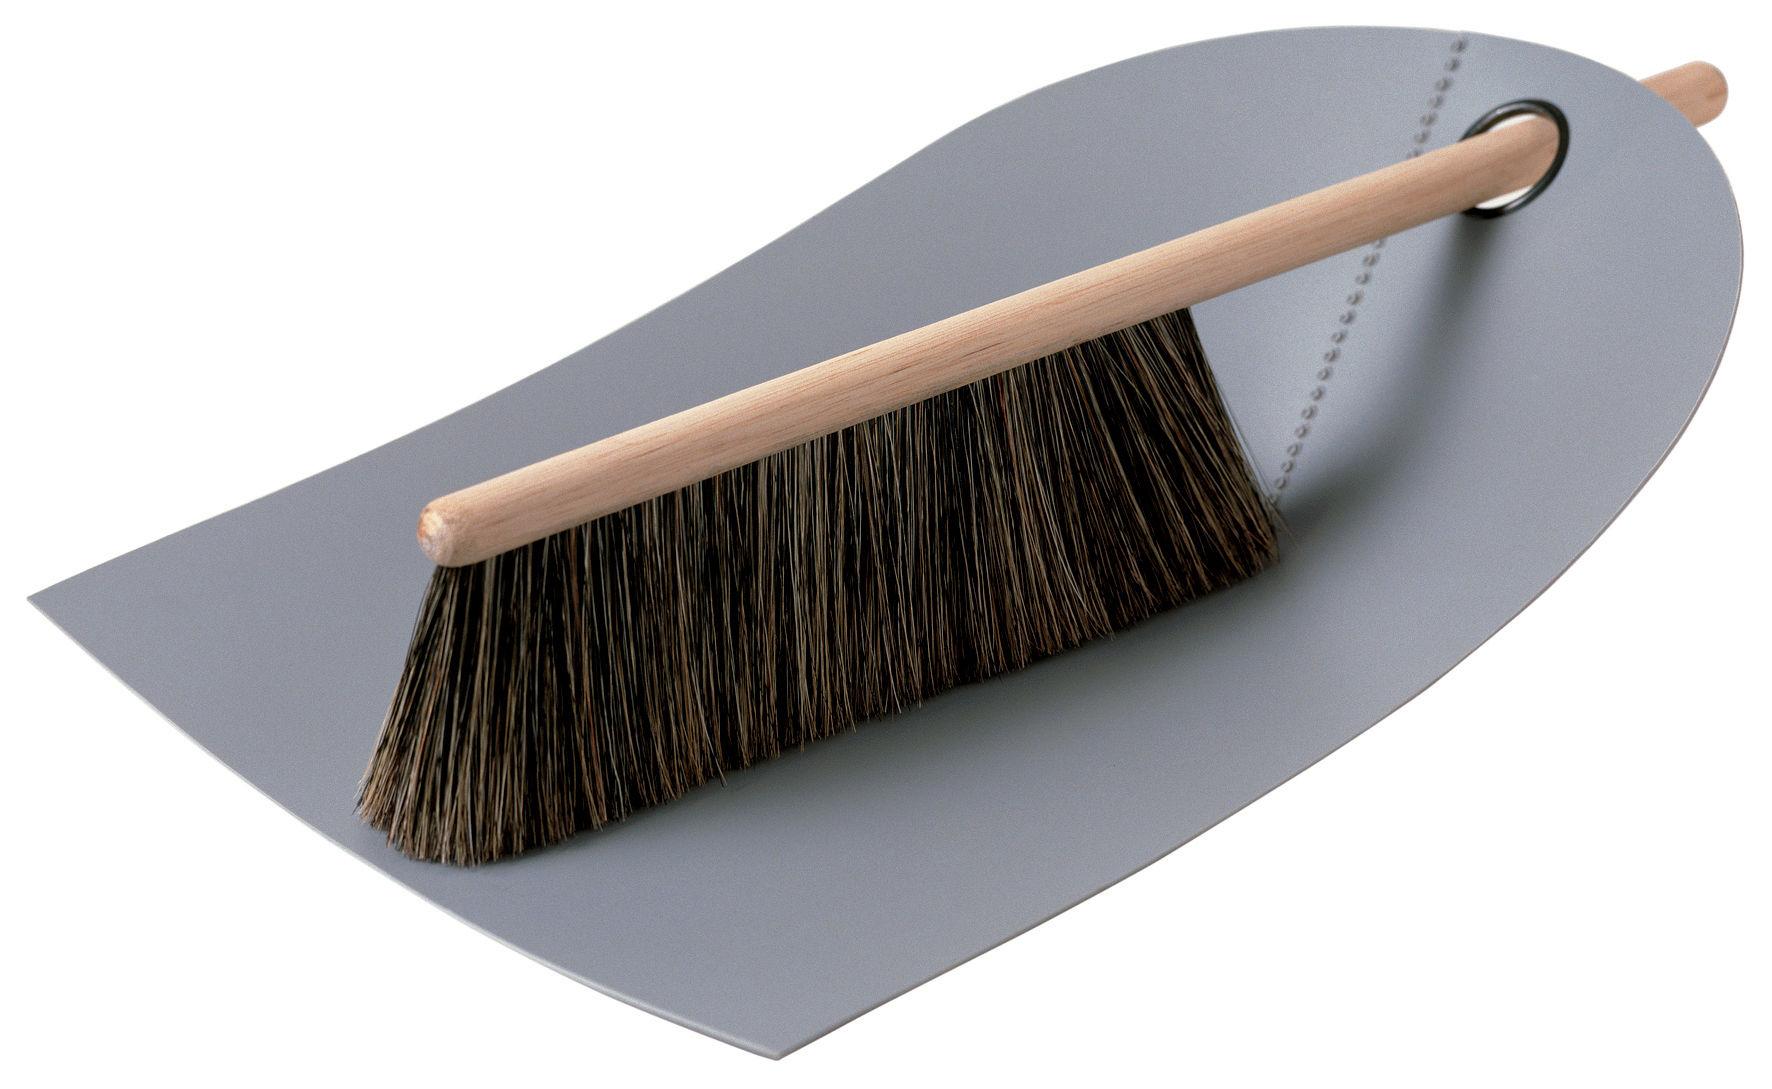 Kitchenware - Kitchen Sink Accessories - Dustpan & broom Brush and dustpan set - Dustpan and brush by Normann Copenhagen - Light Grey - Beechwood, Polypropylene